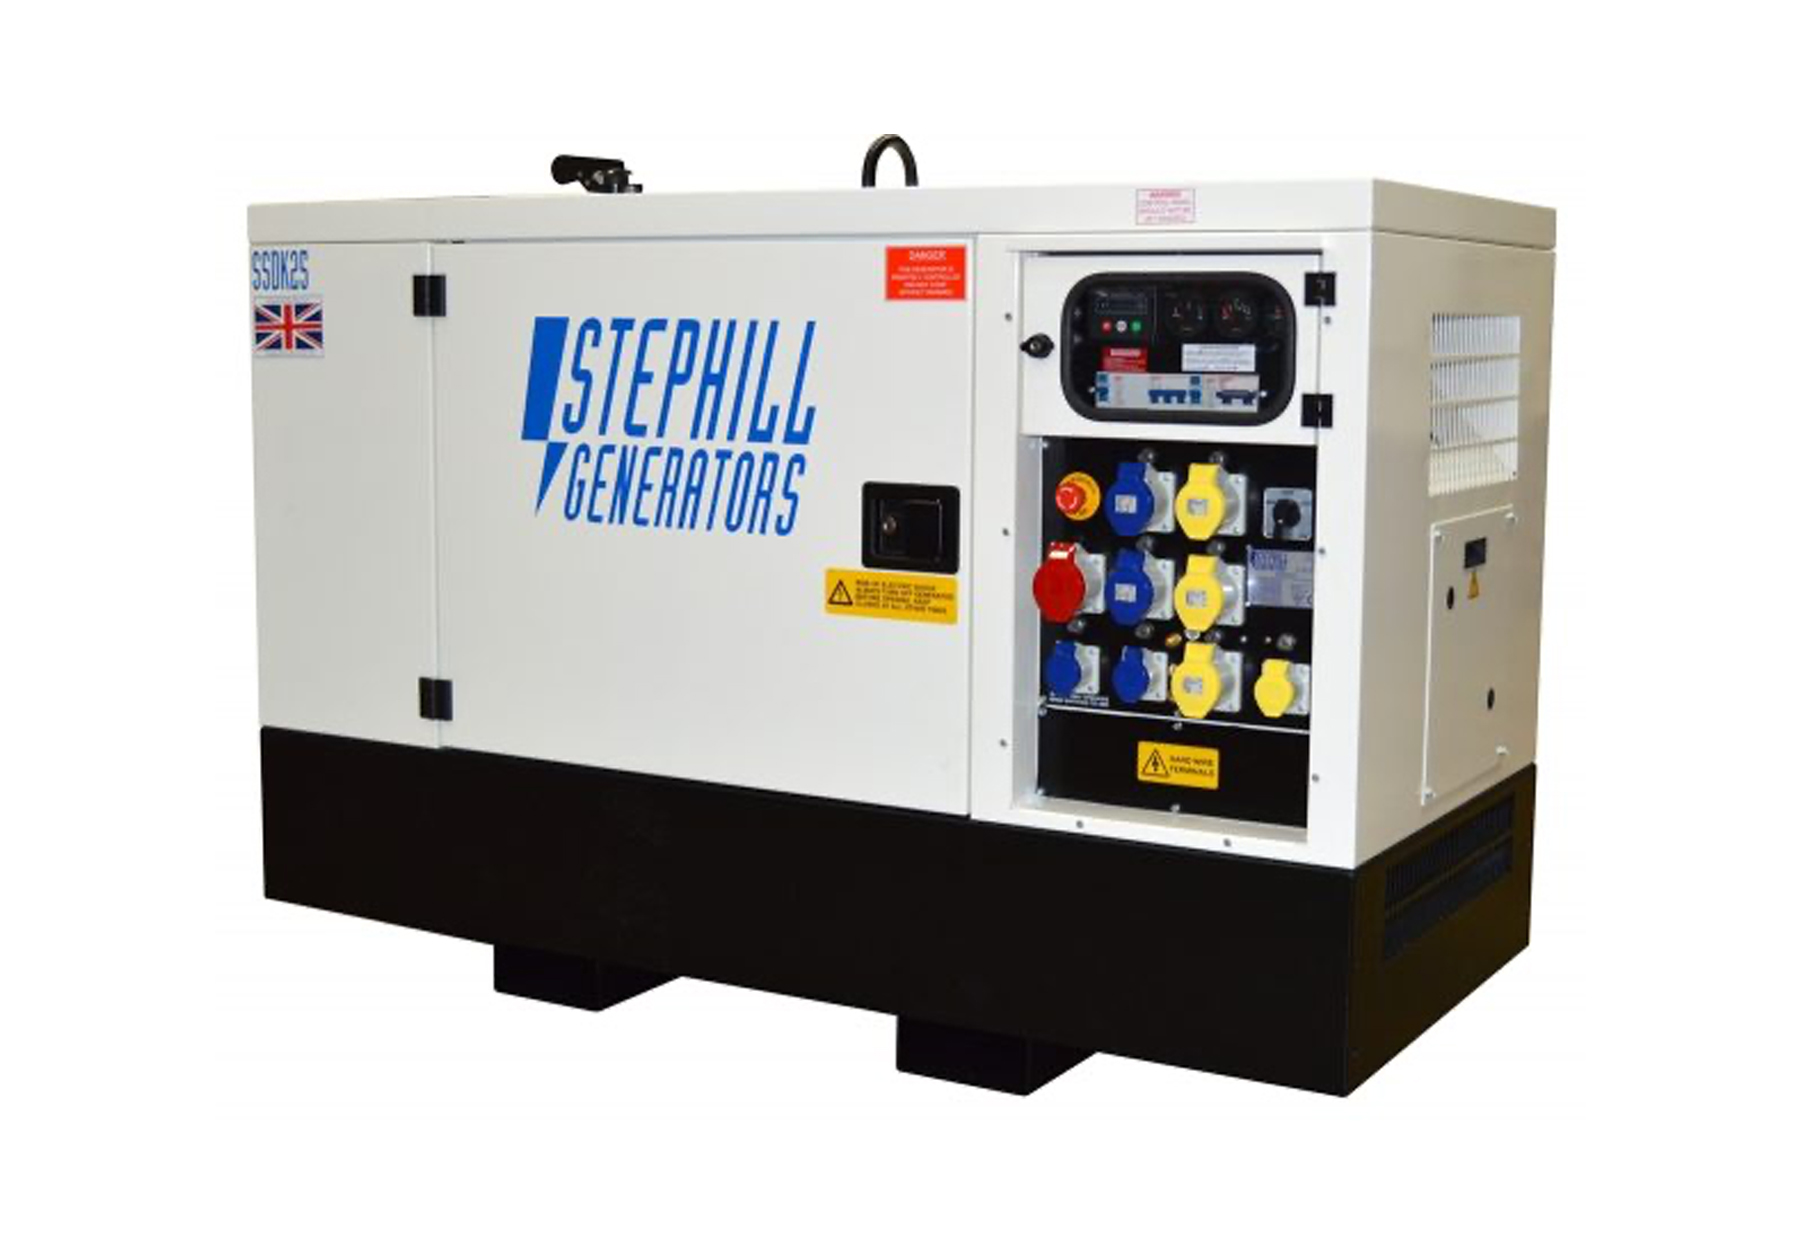 Hire Super Silent & suitcase generators in Cardiff, Swansea, Newport, Carmarthenshire, Pembrokeshire & South West Wales